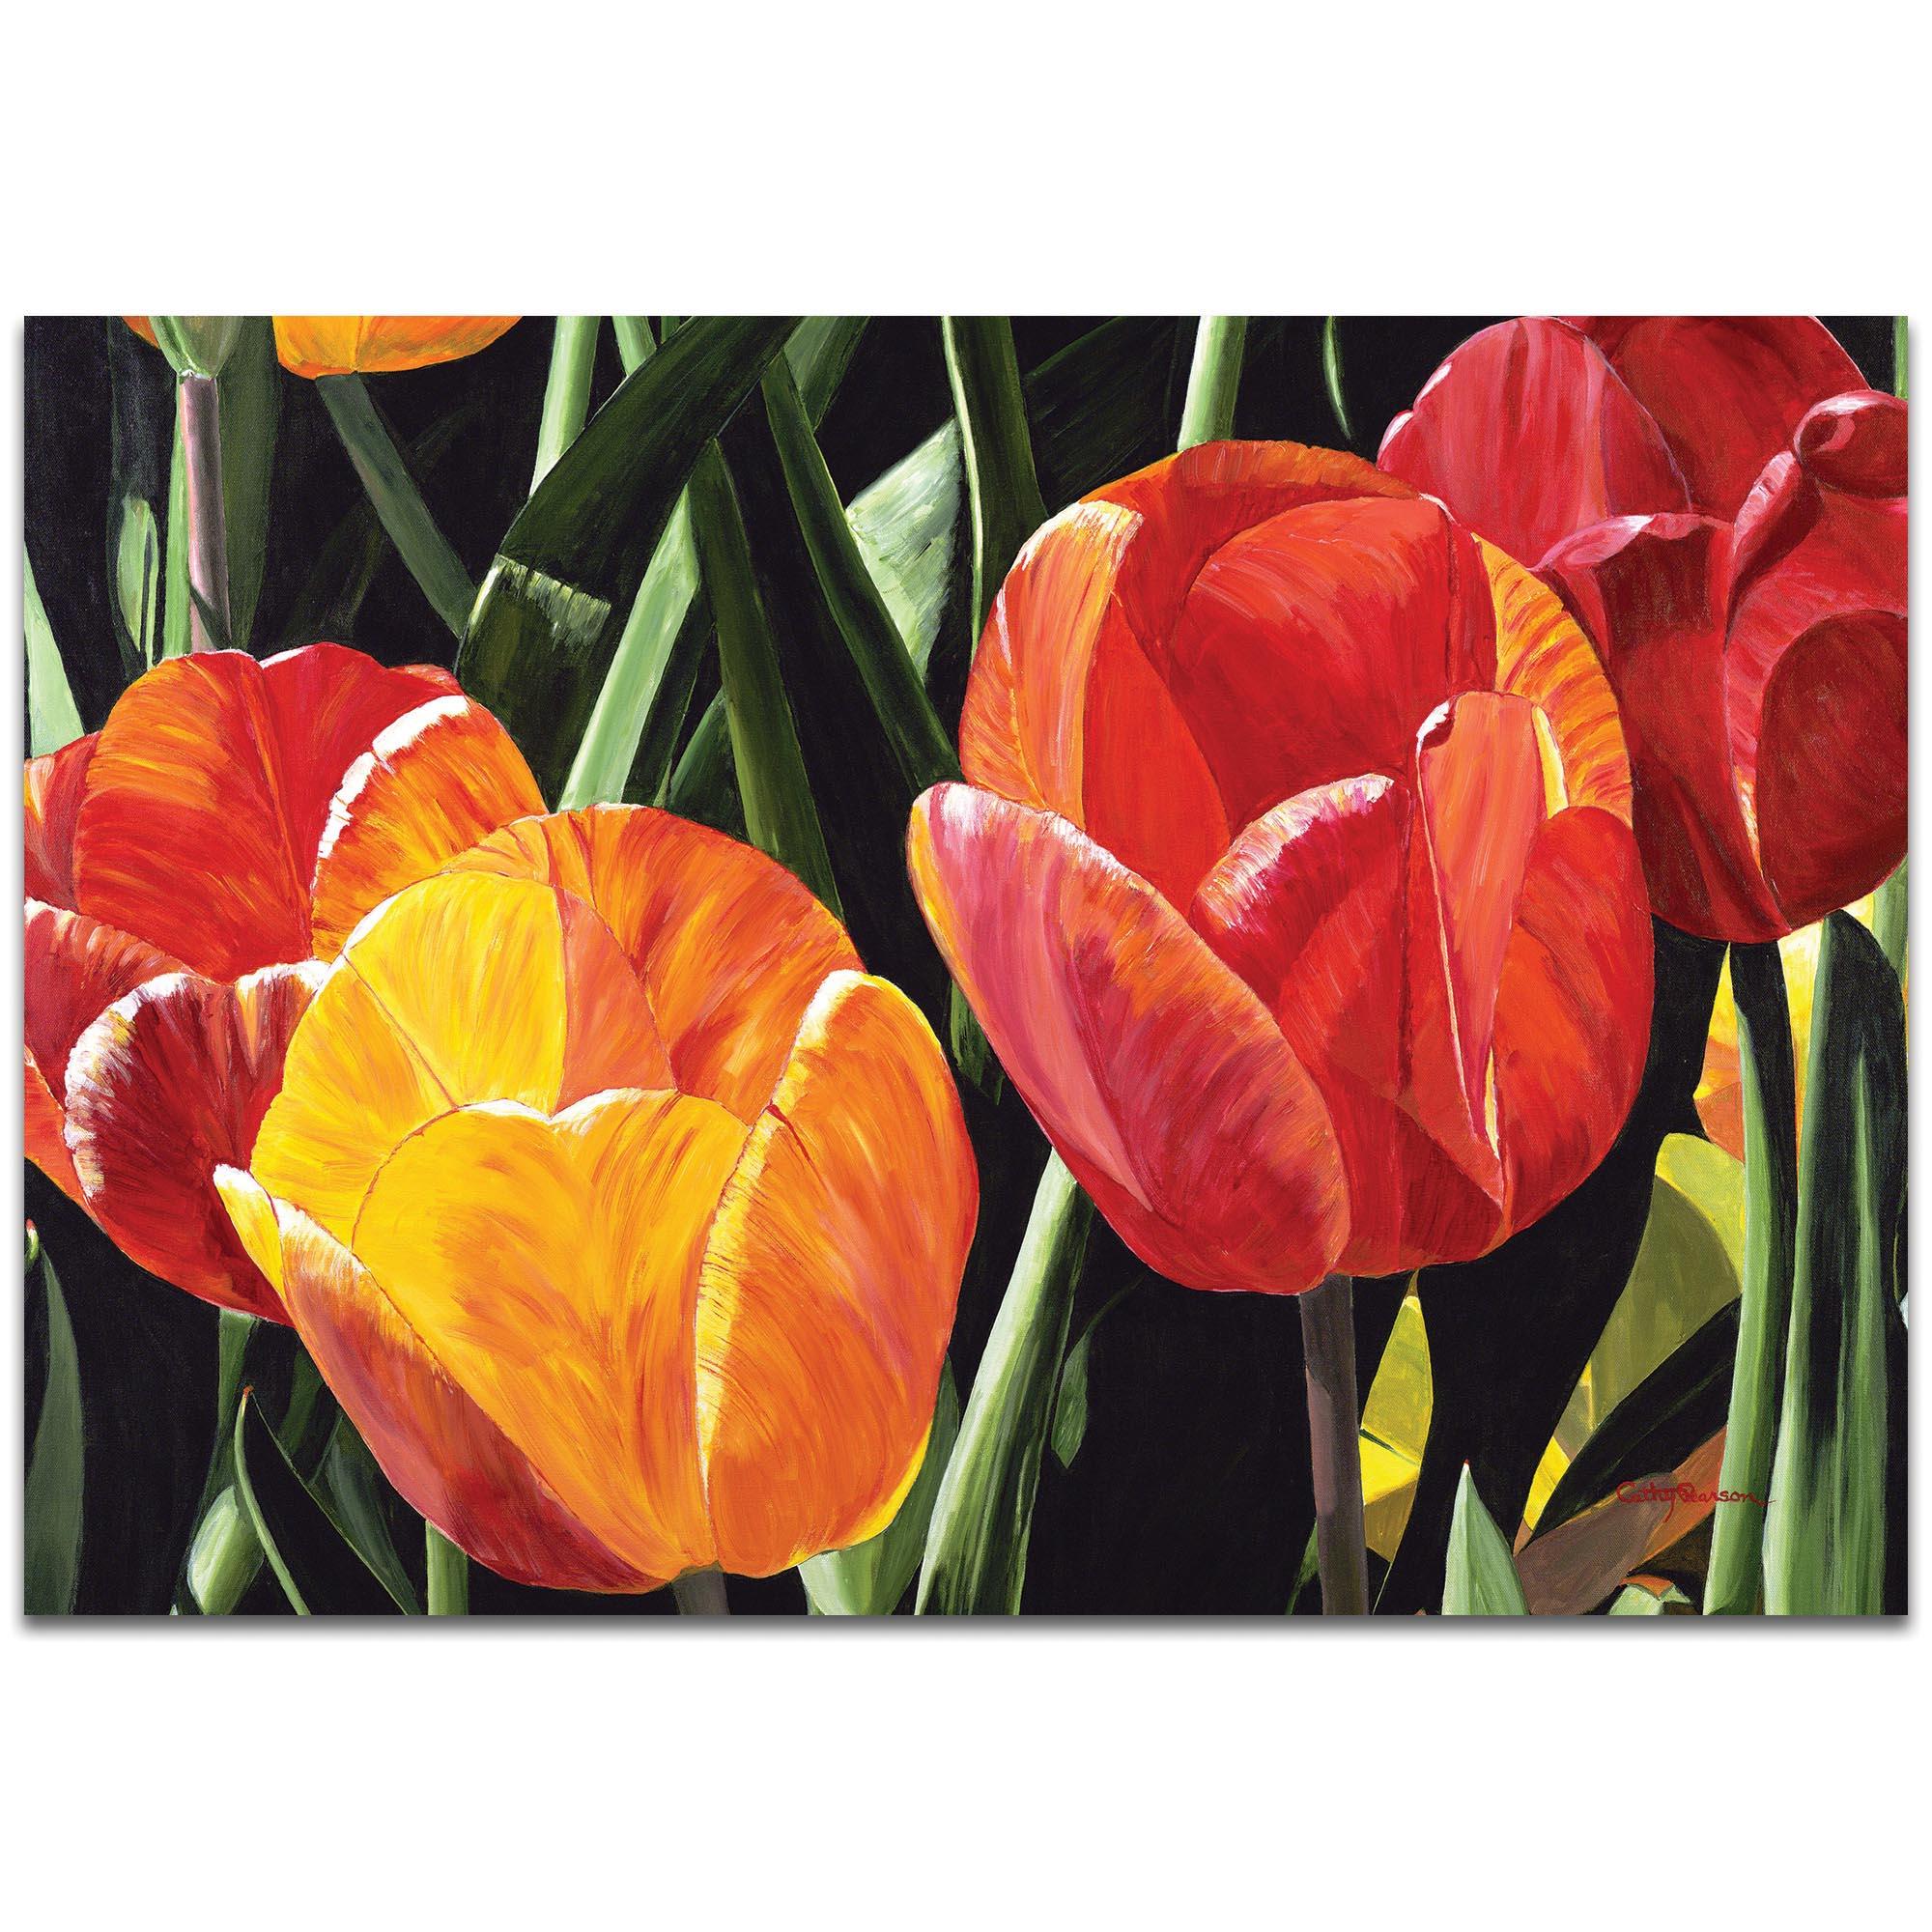 Traditional Wall Art 'Tulip Field' - Floral Decor on Metal or Plexiglass